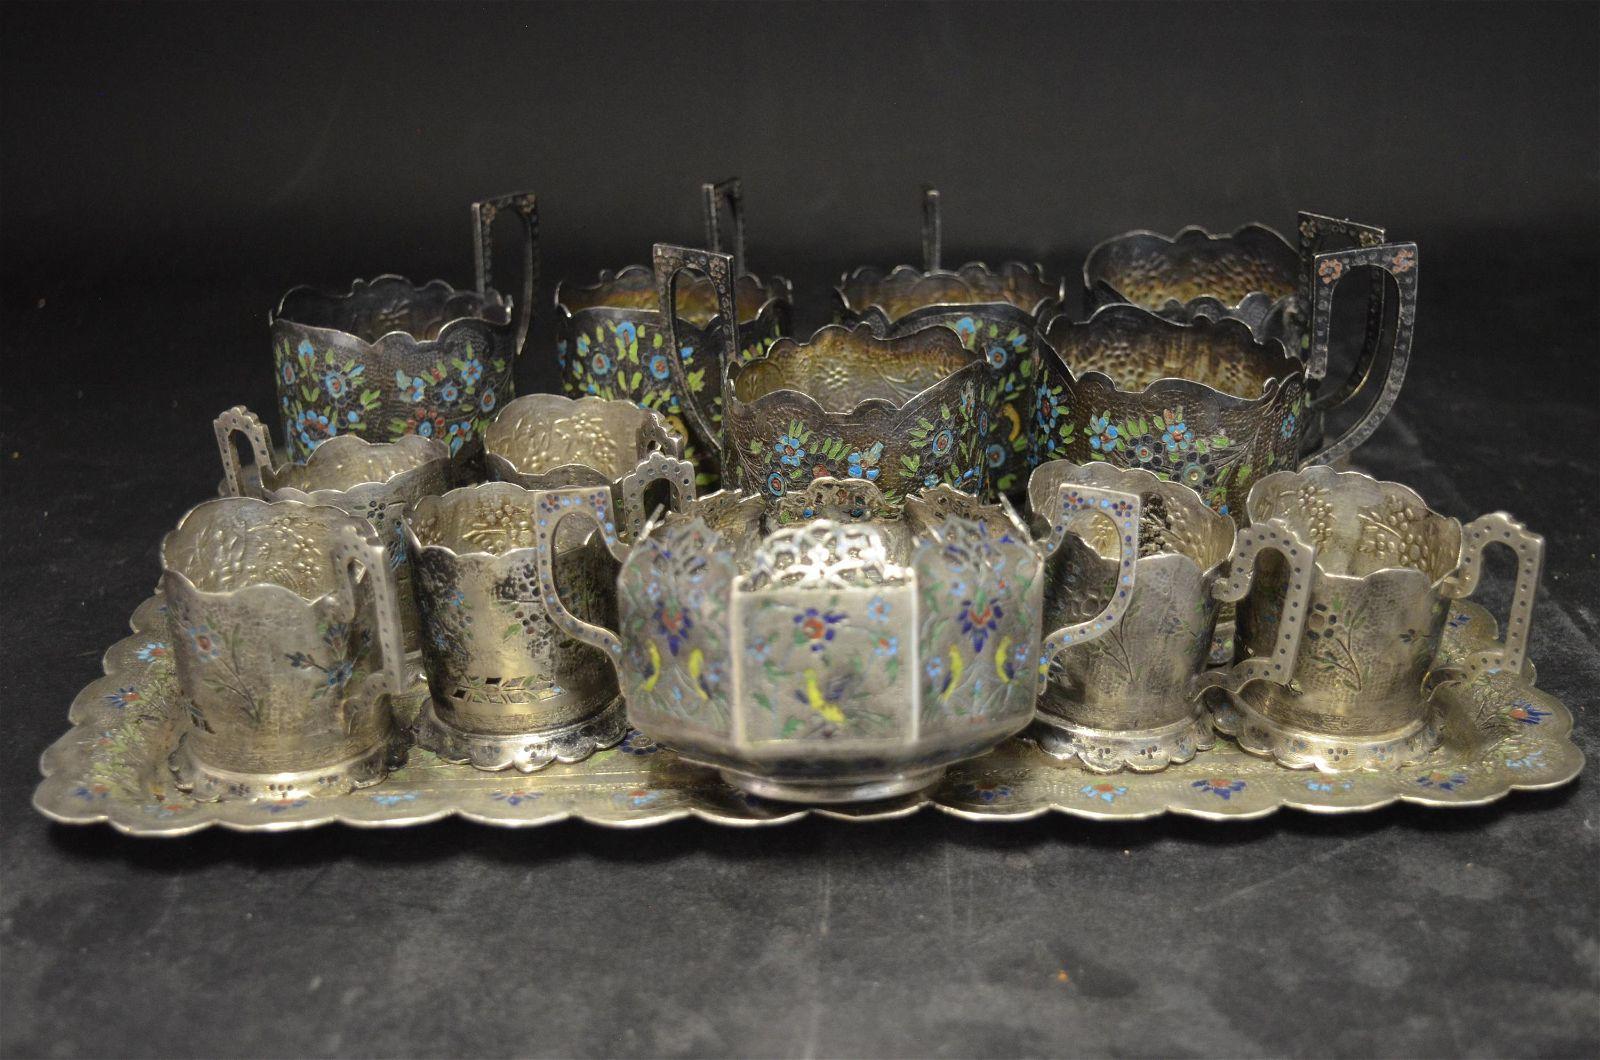 An Extensive Silver & Enamel Tea Set, Iran